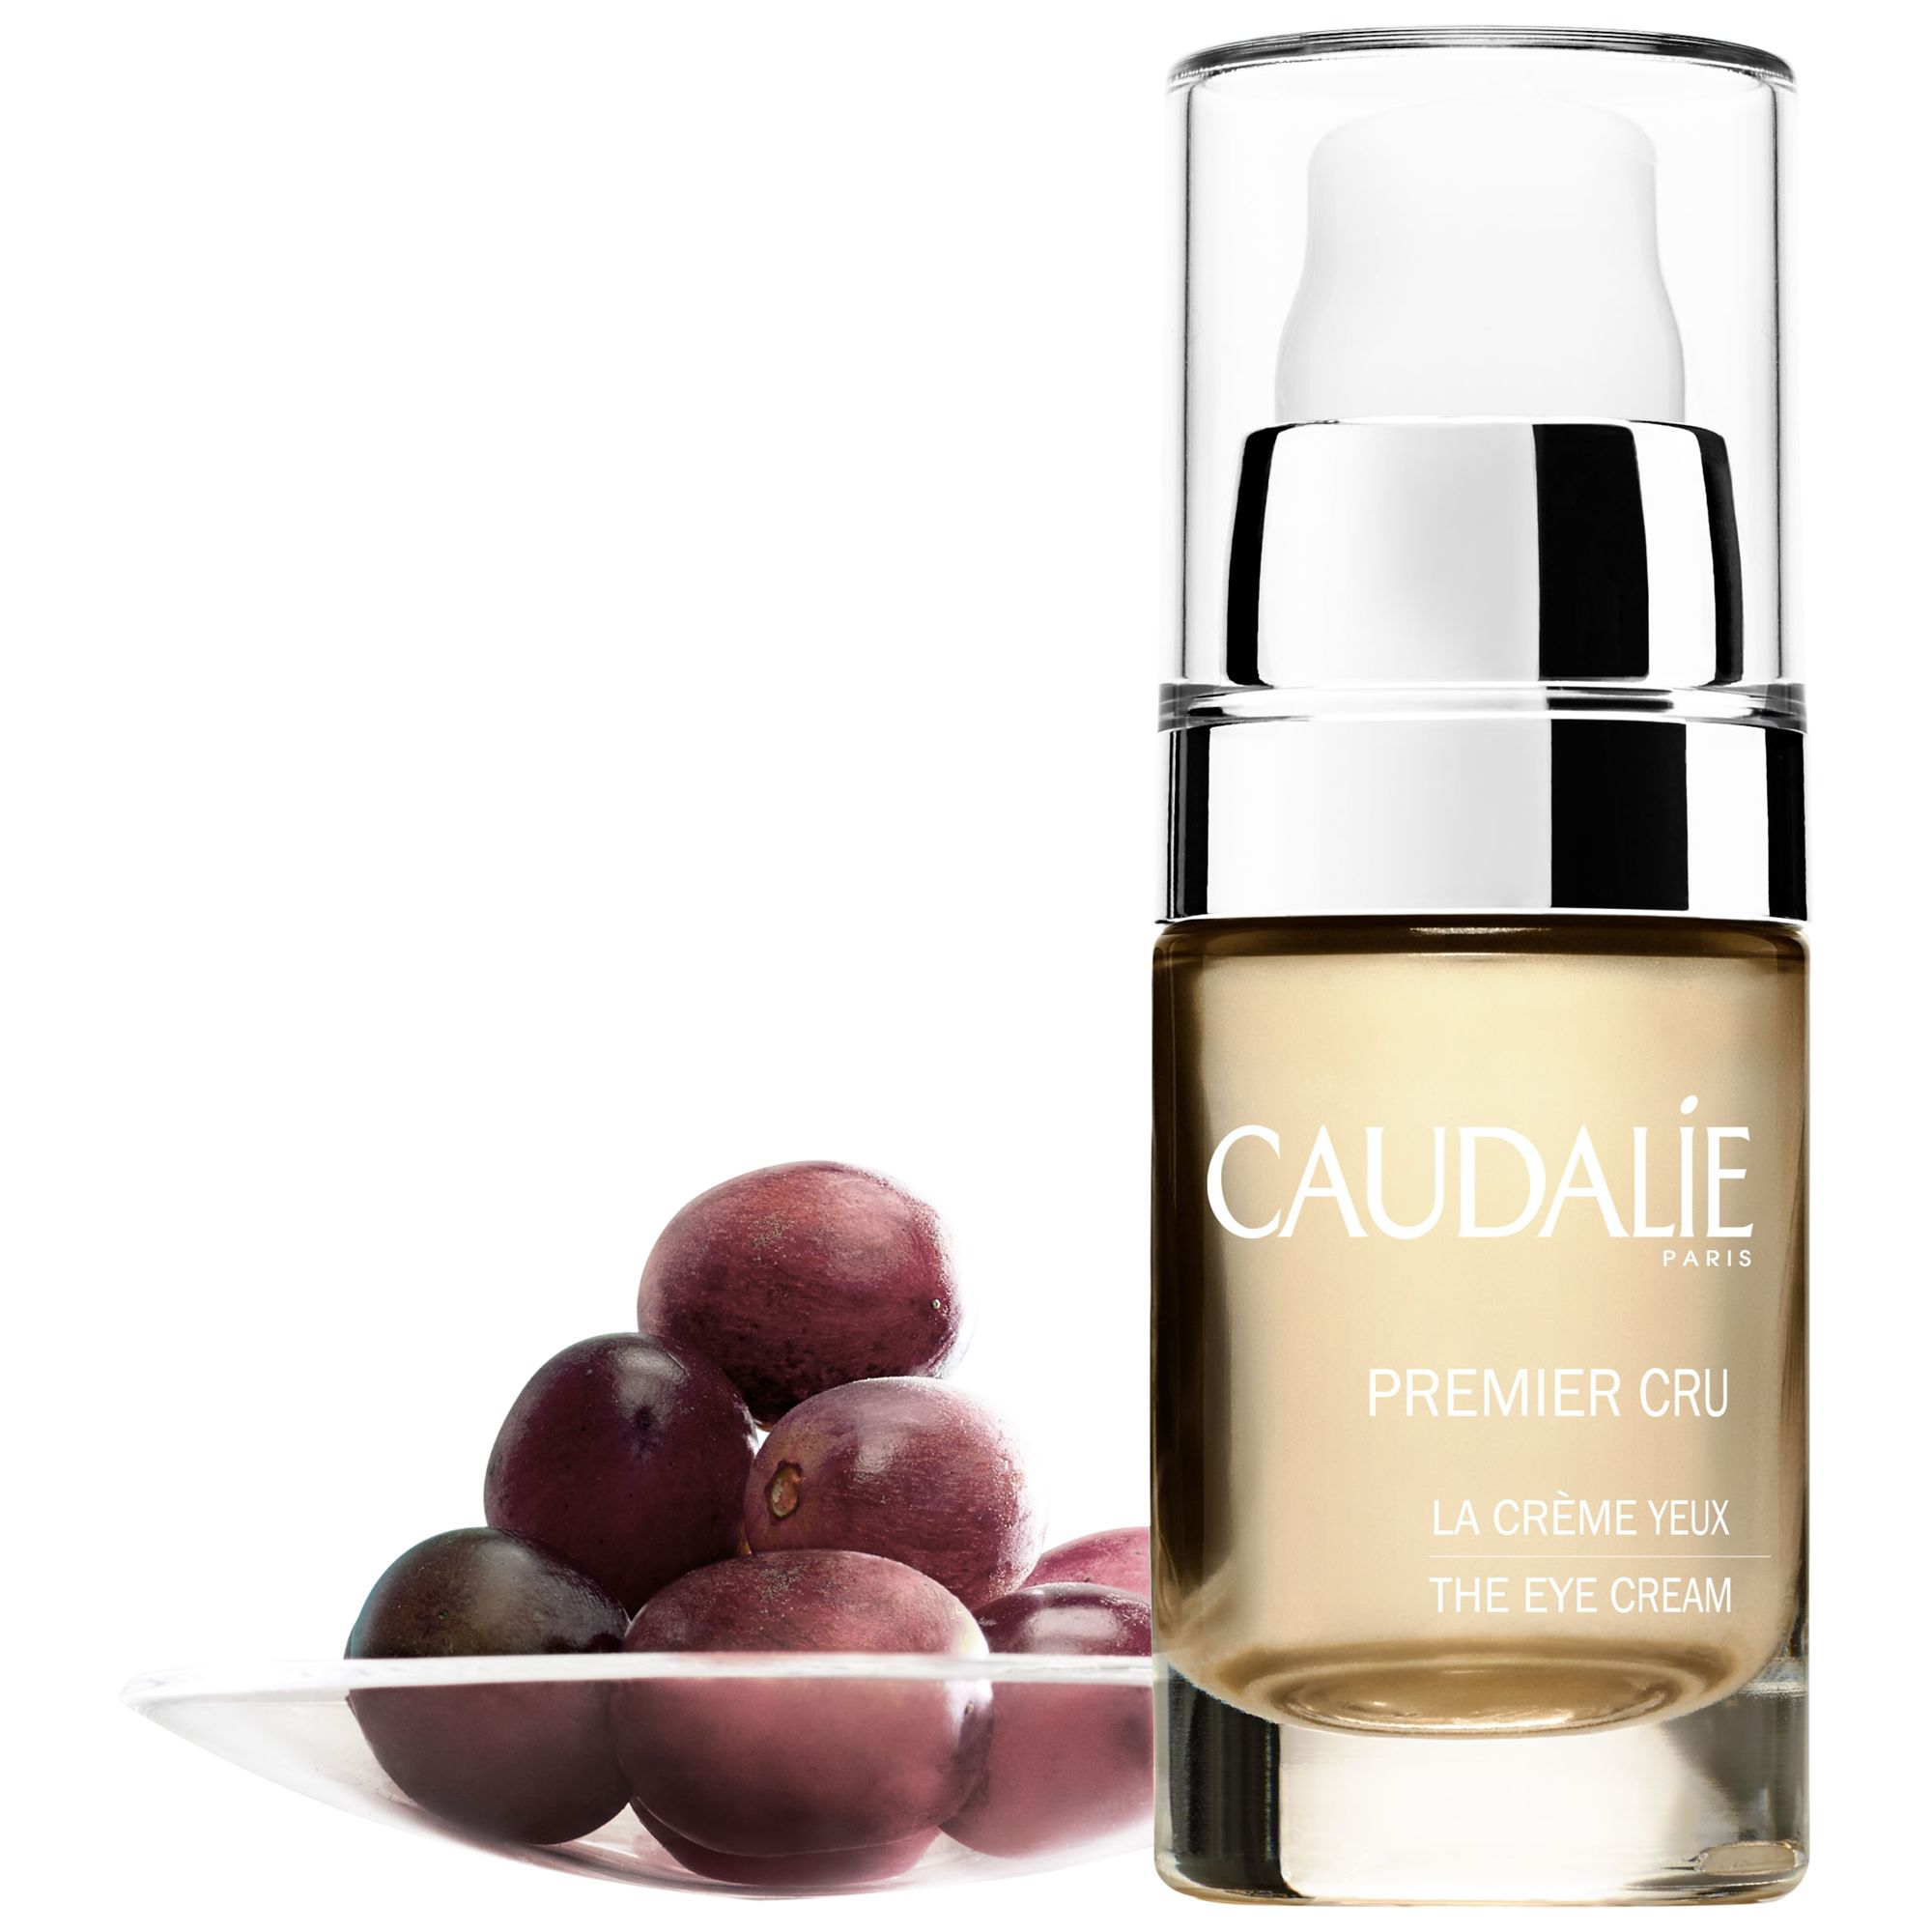 Caudalie Caudalie Premier Cru The Eye Cream, 15ml